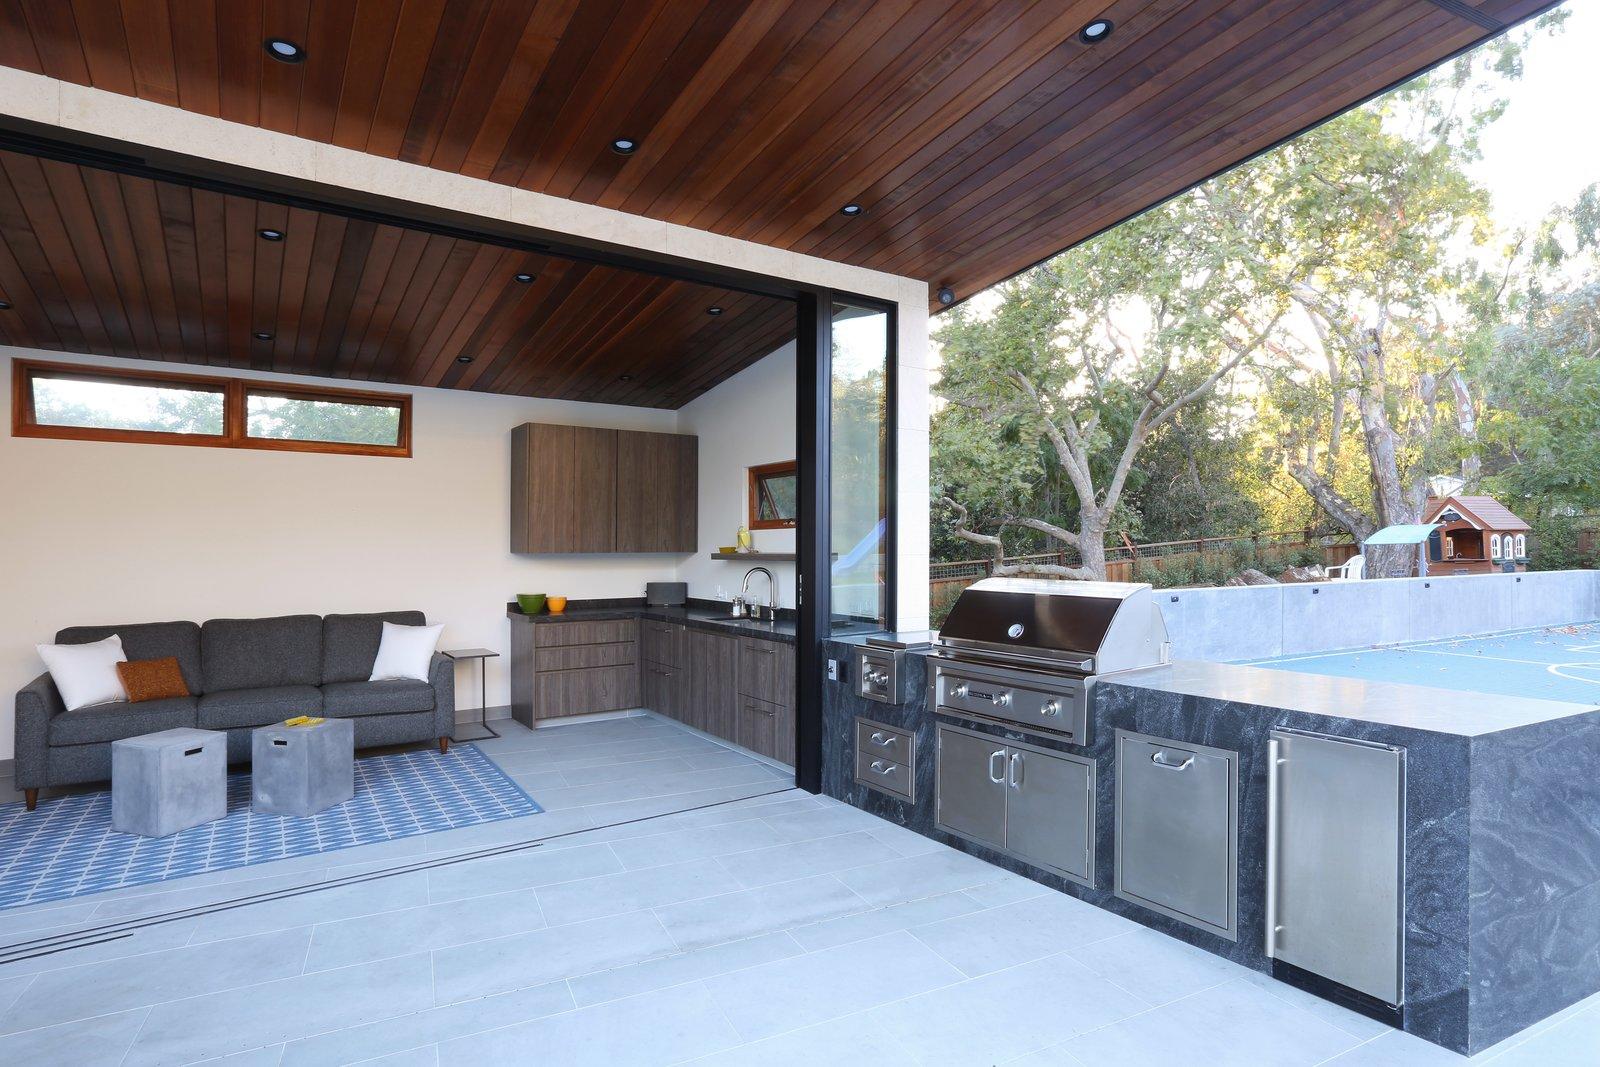 Indoor Outdoor Kitchen  Los Altos Hills Landscape by Greenblott Design